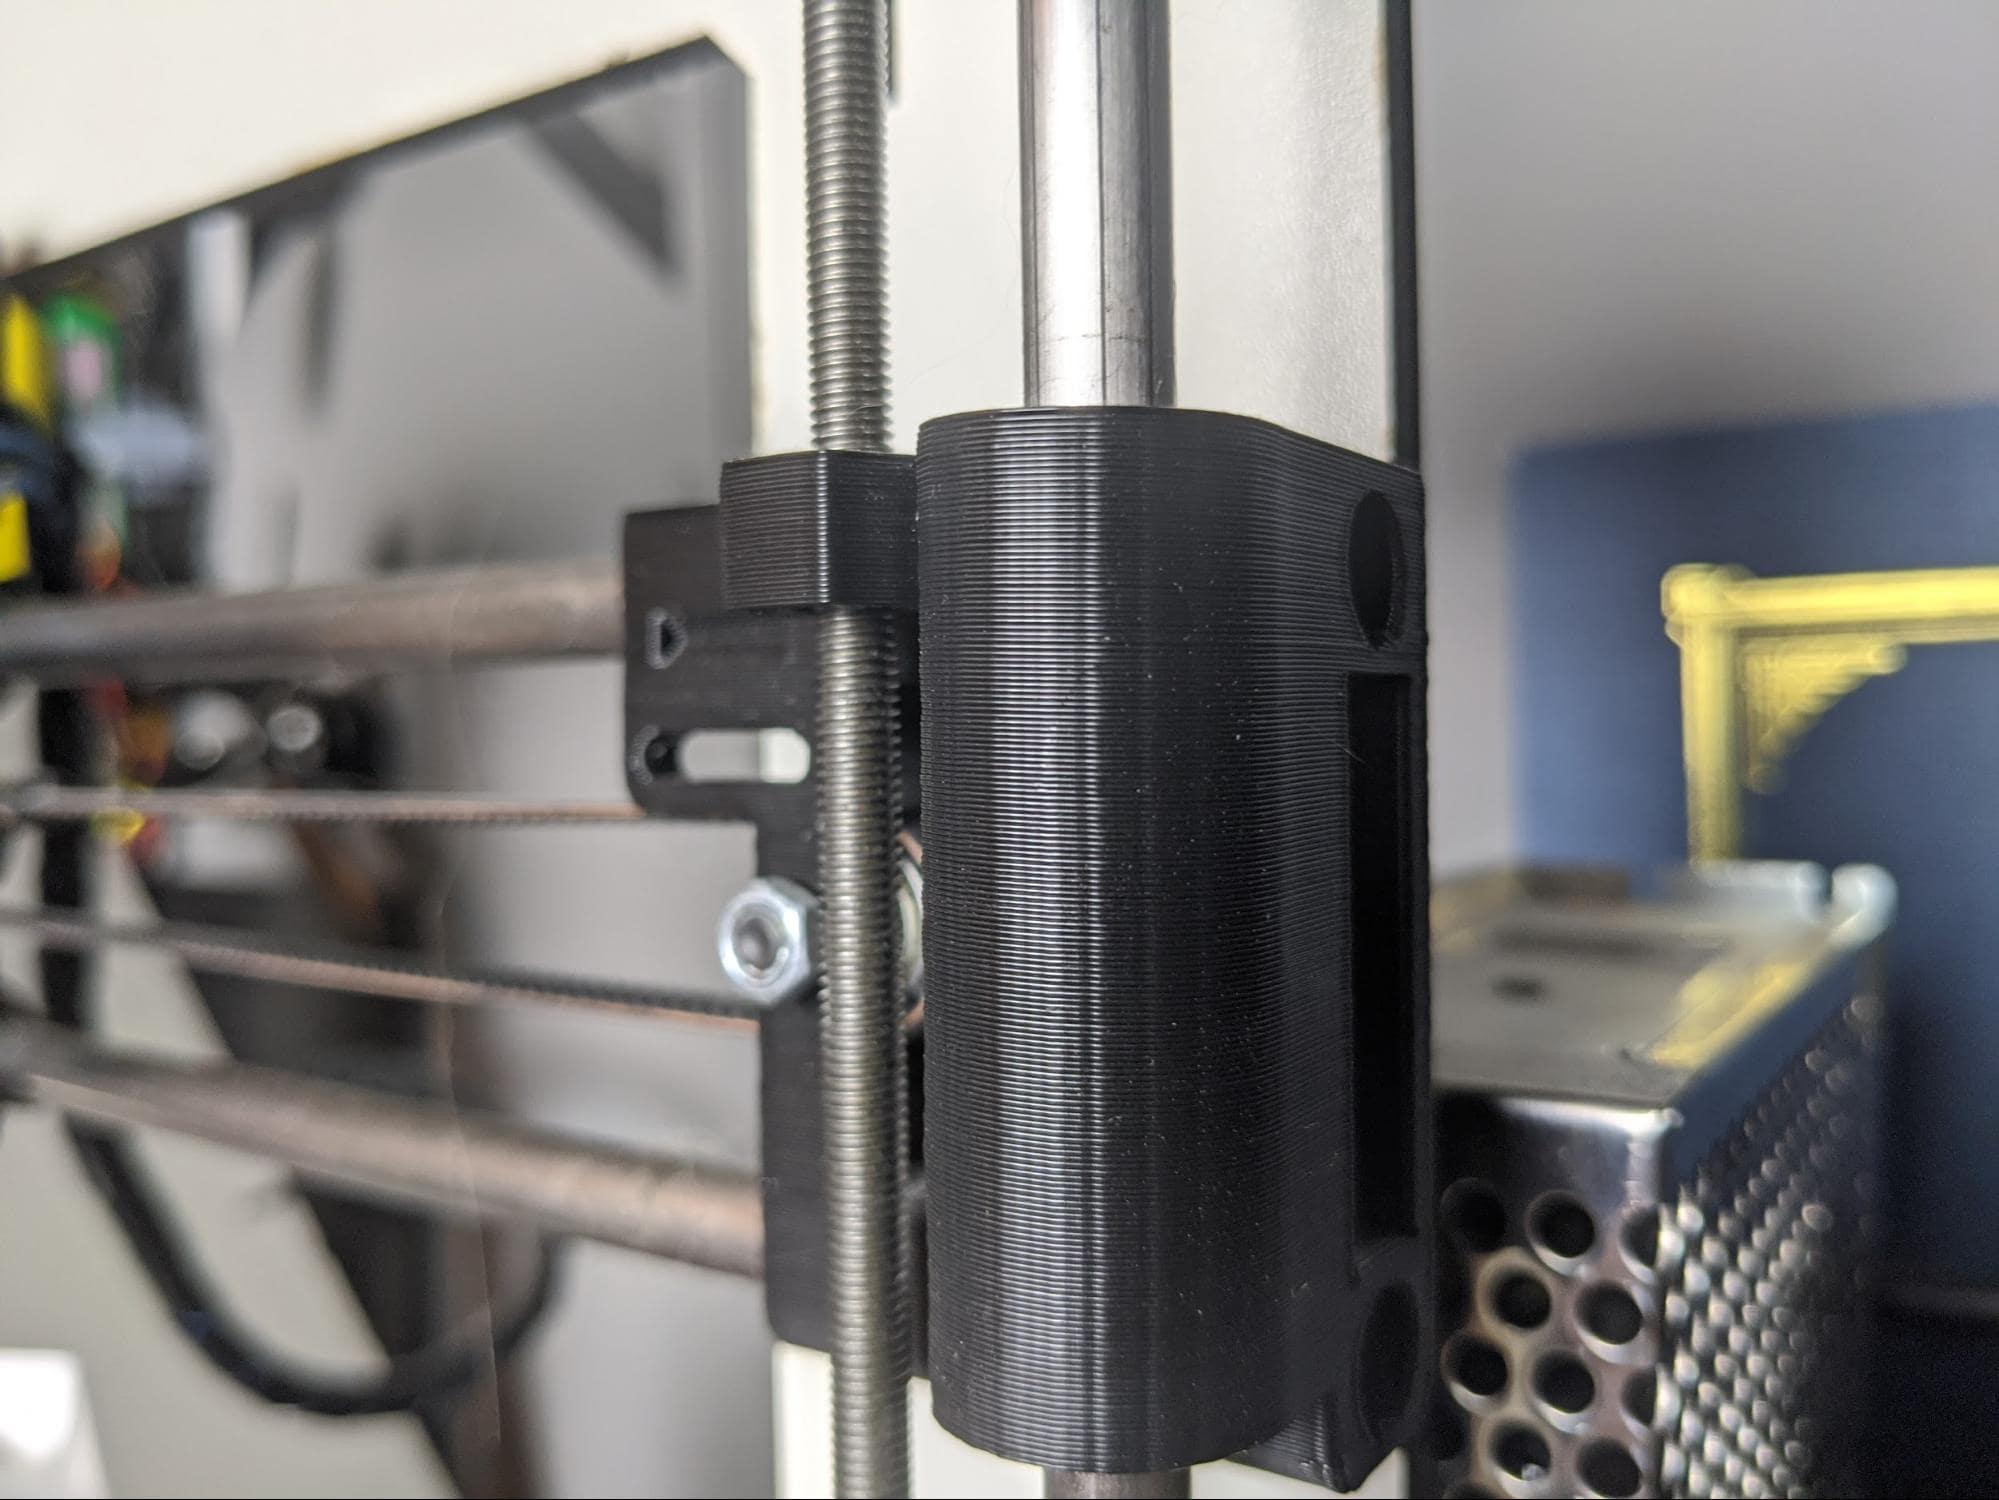 3D_Printing_Prototypes_SH_MP_image8.jpg